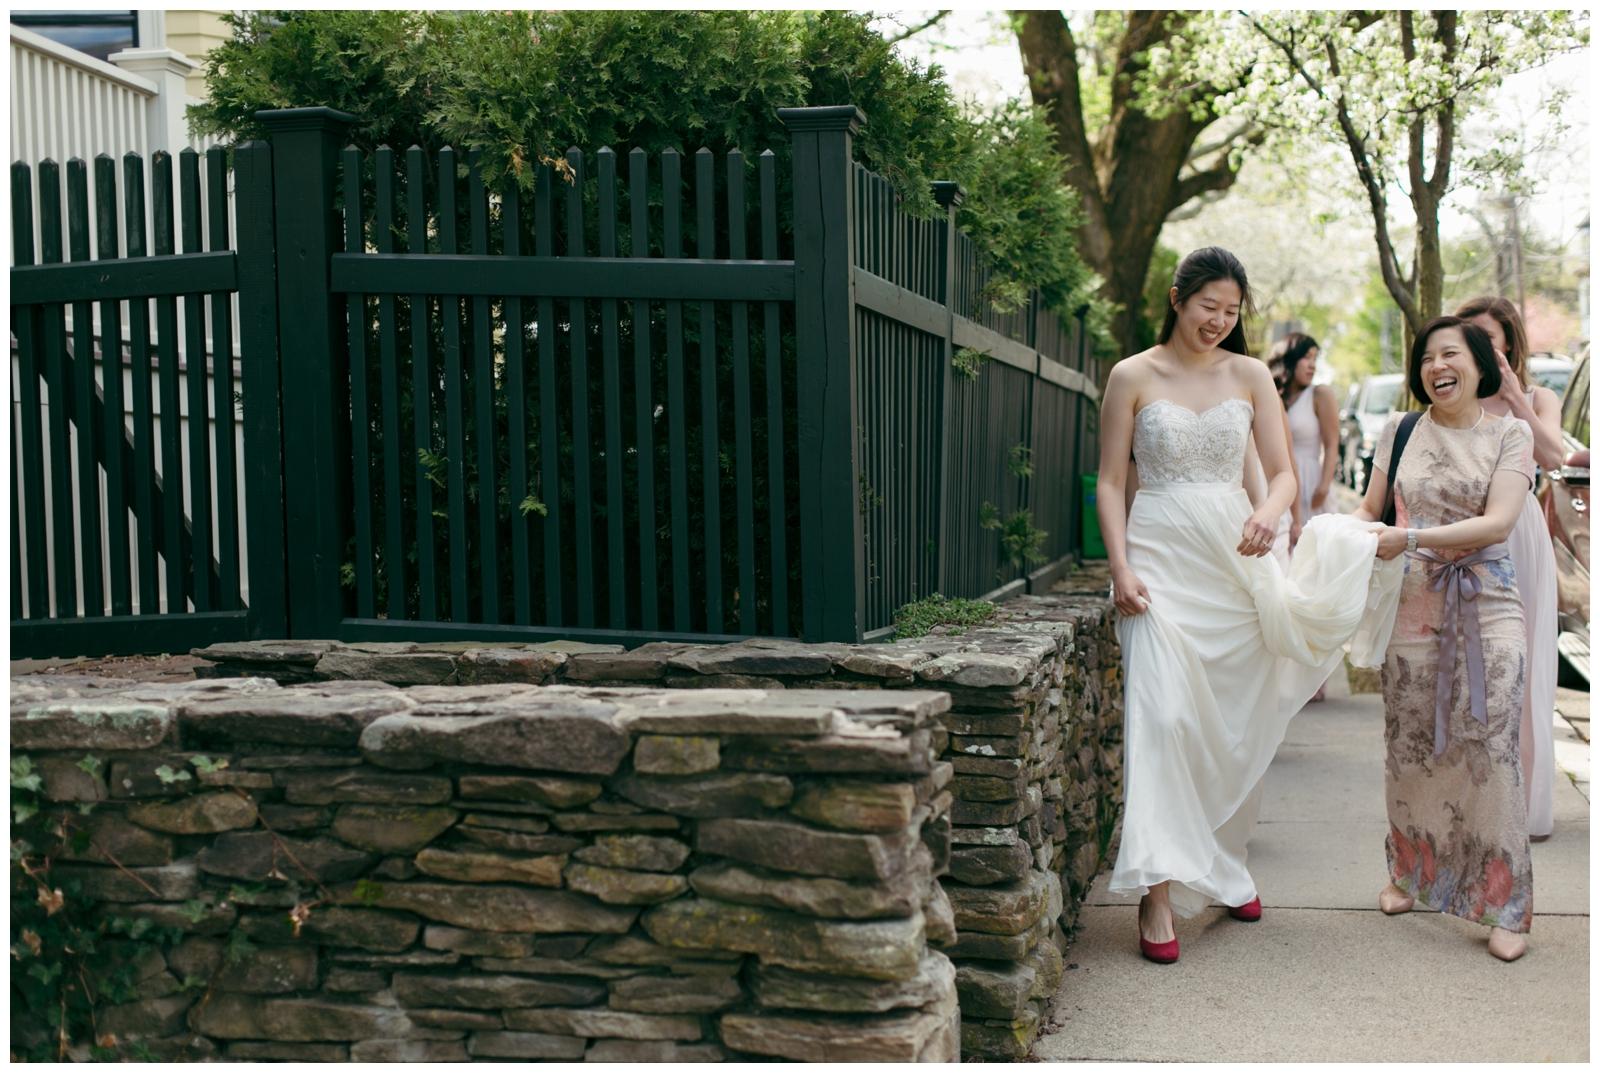 Samberg-Conference-Center-Boston-Wedding-Photographer-Bailey-Q-Photo-019.jpg